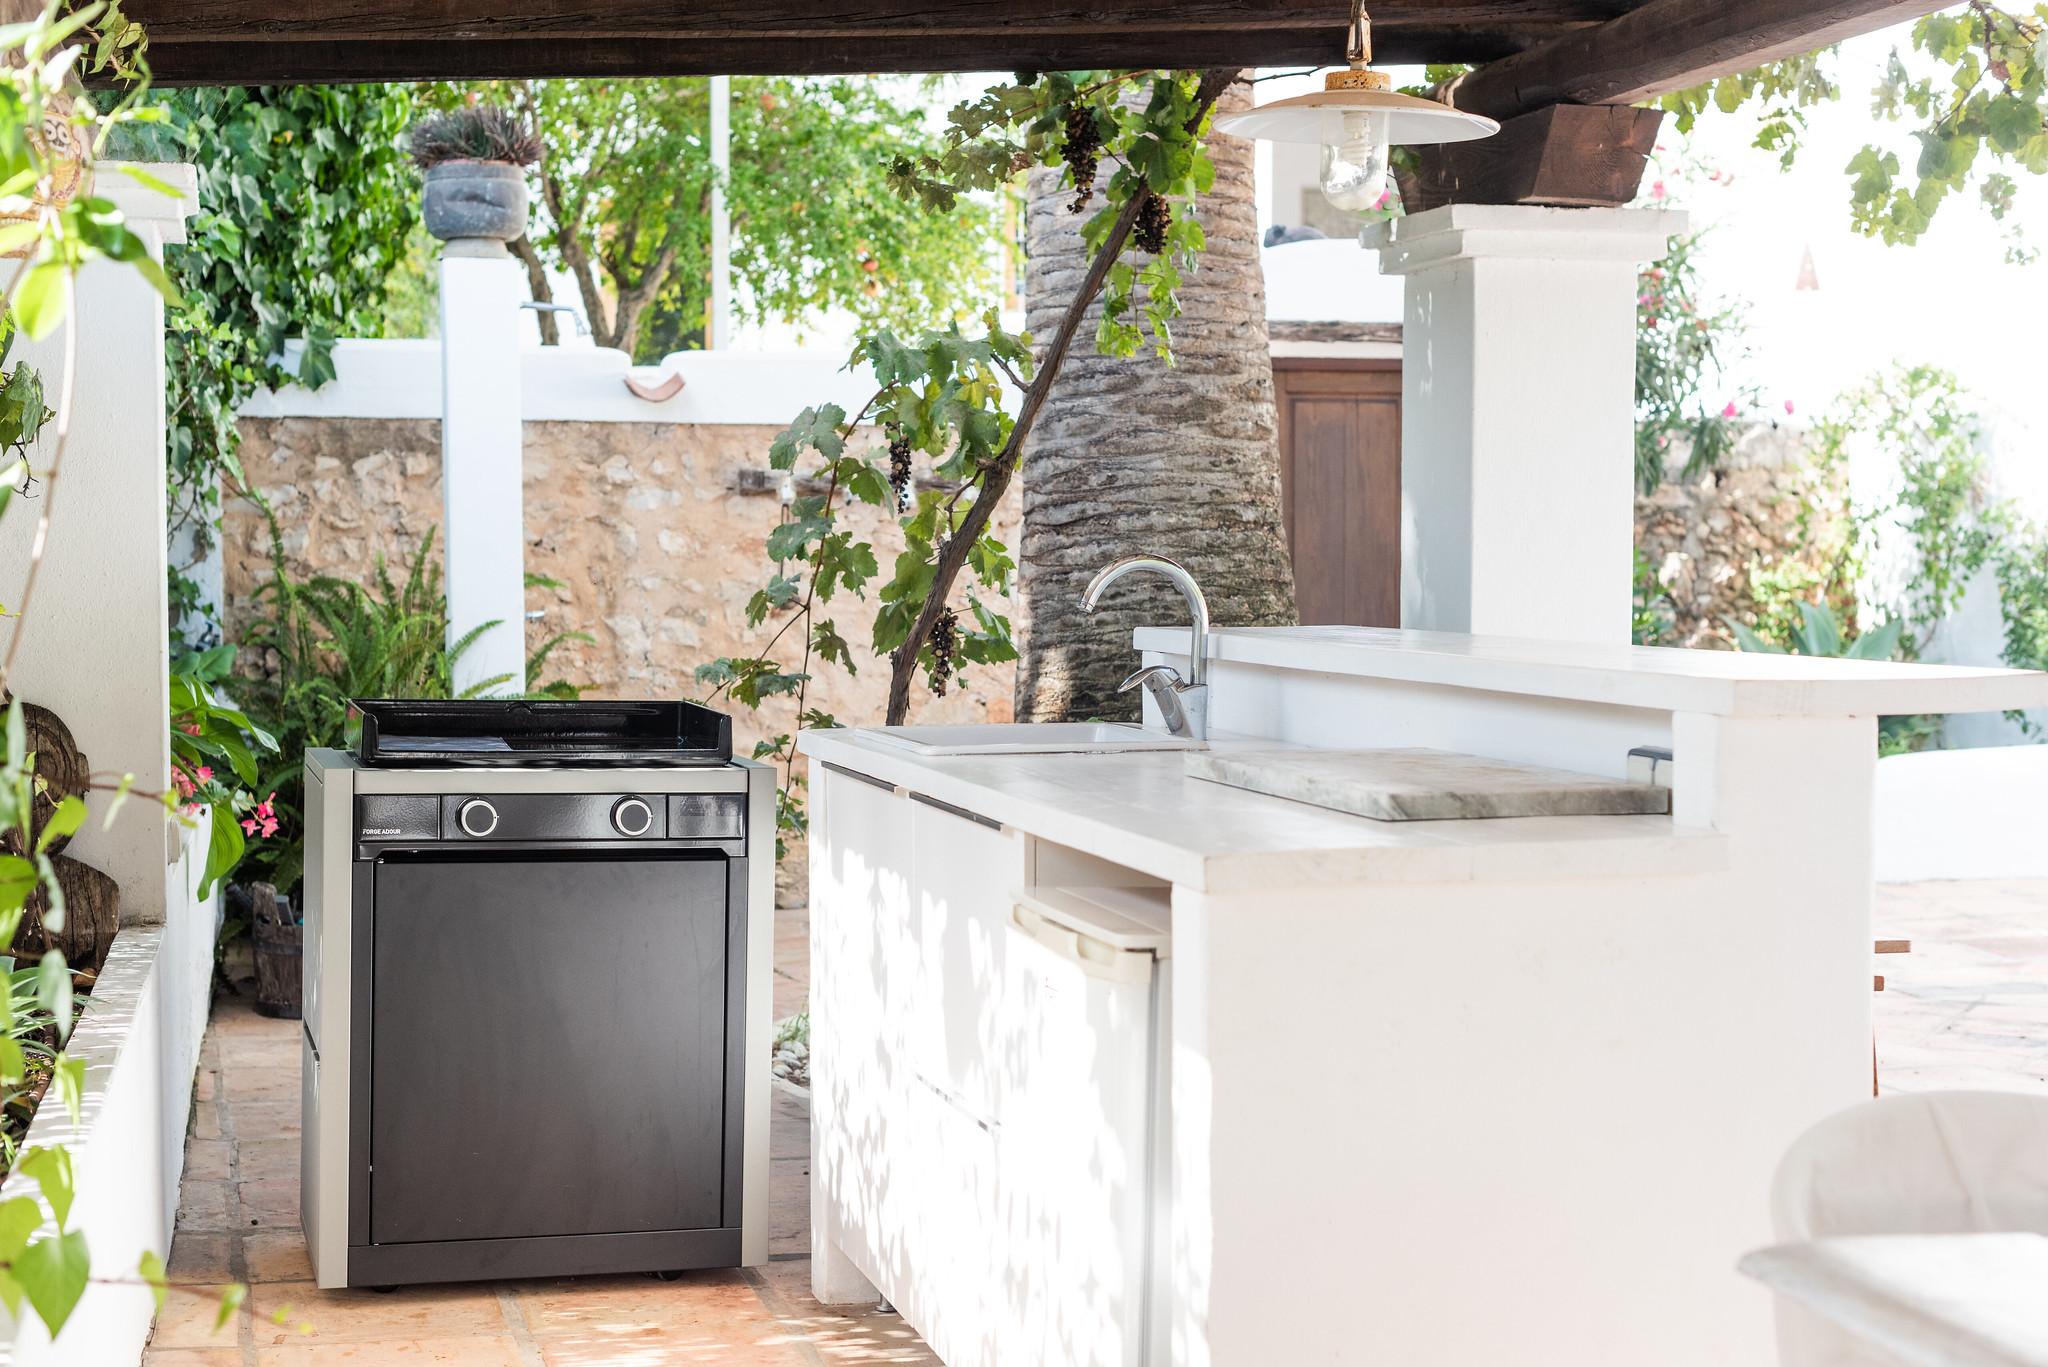 https://www.white-ibiza.com/wp-content/uploads/2020/05/white-ibiza-villas-can-lyra-exterior-outside-kitchen.jpg